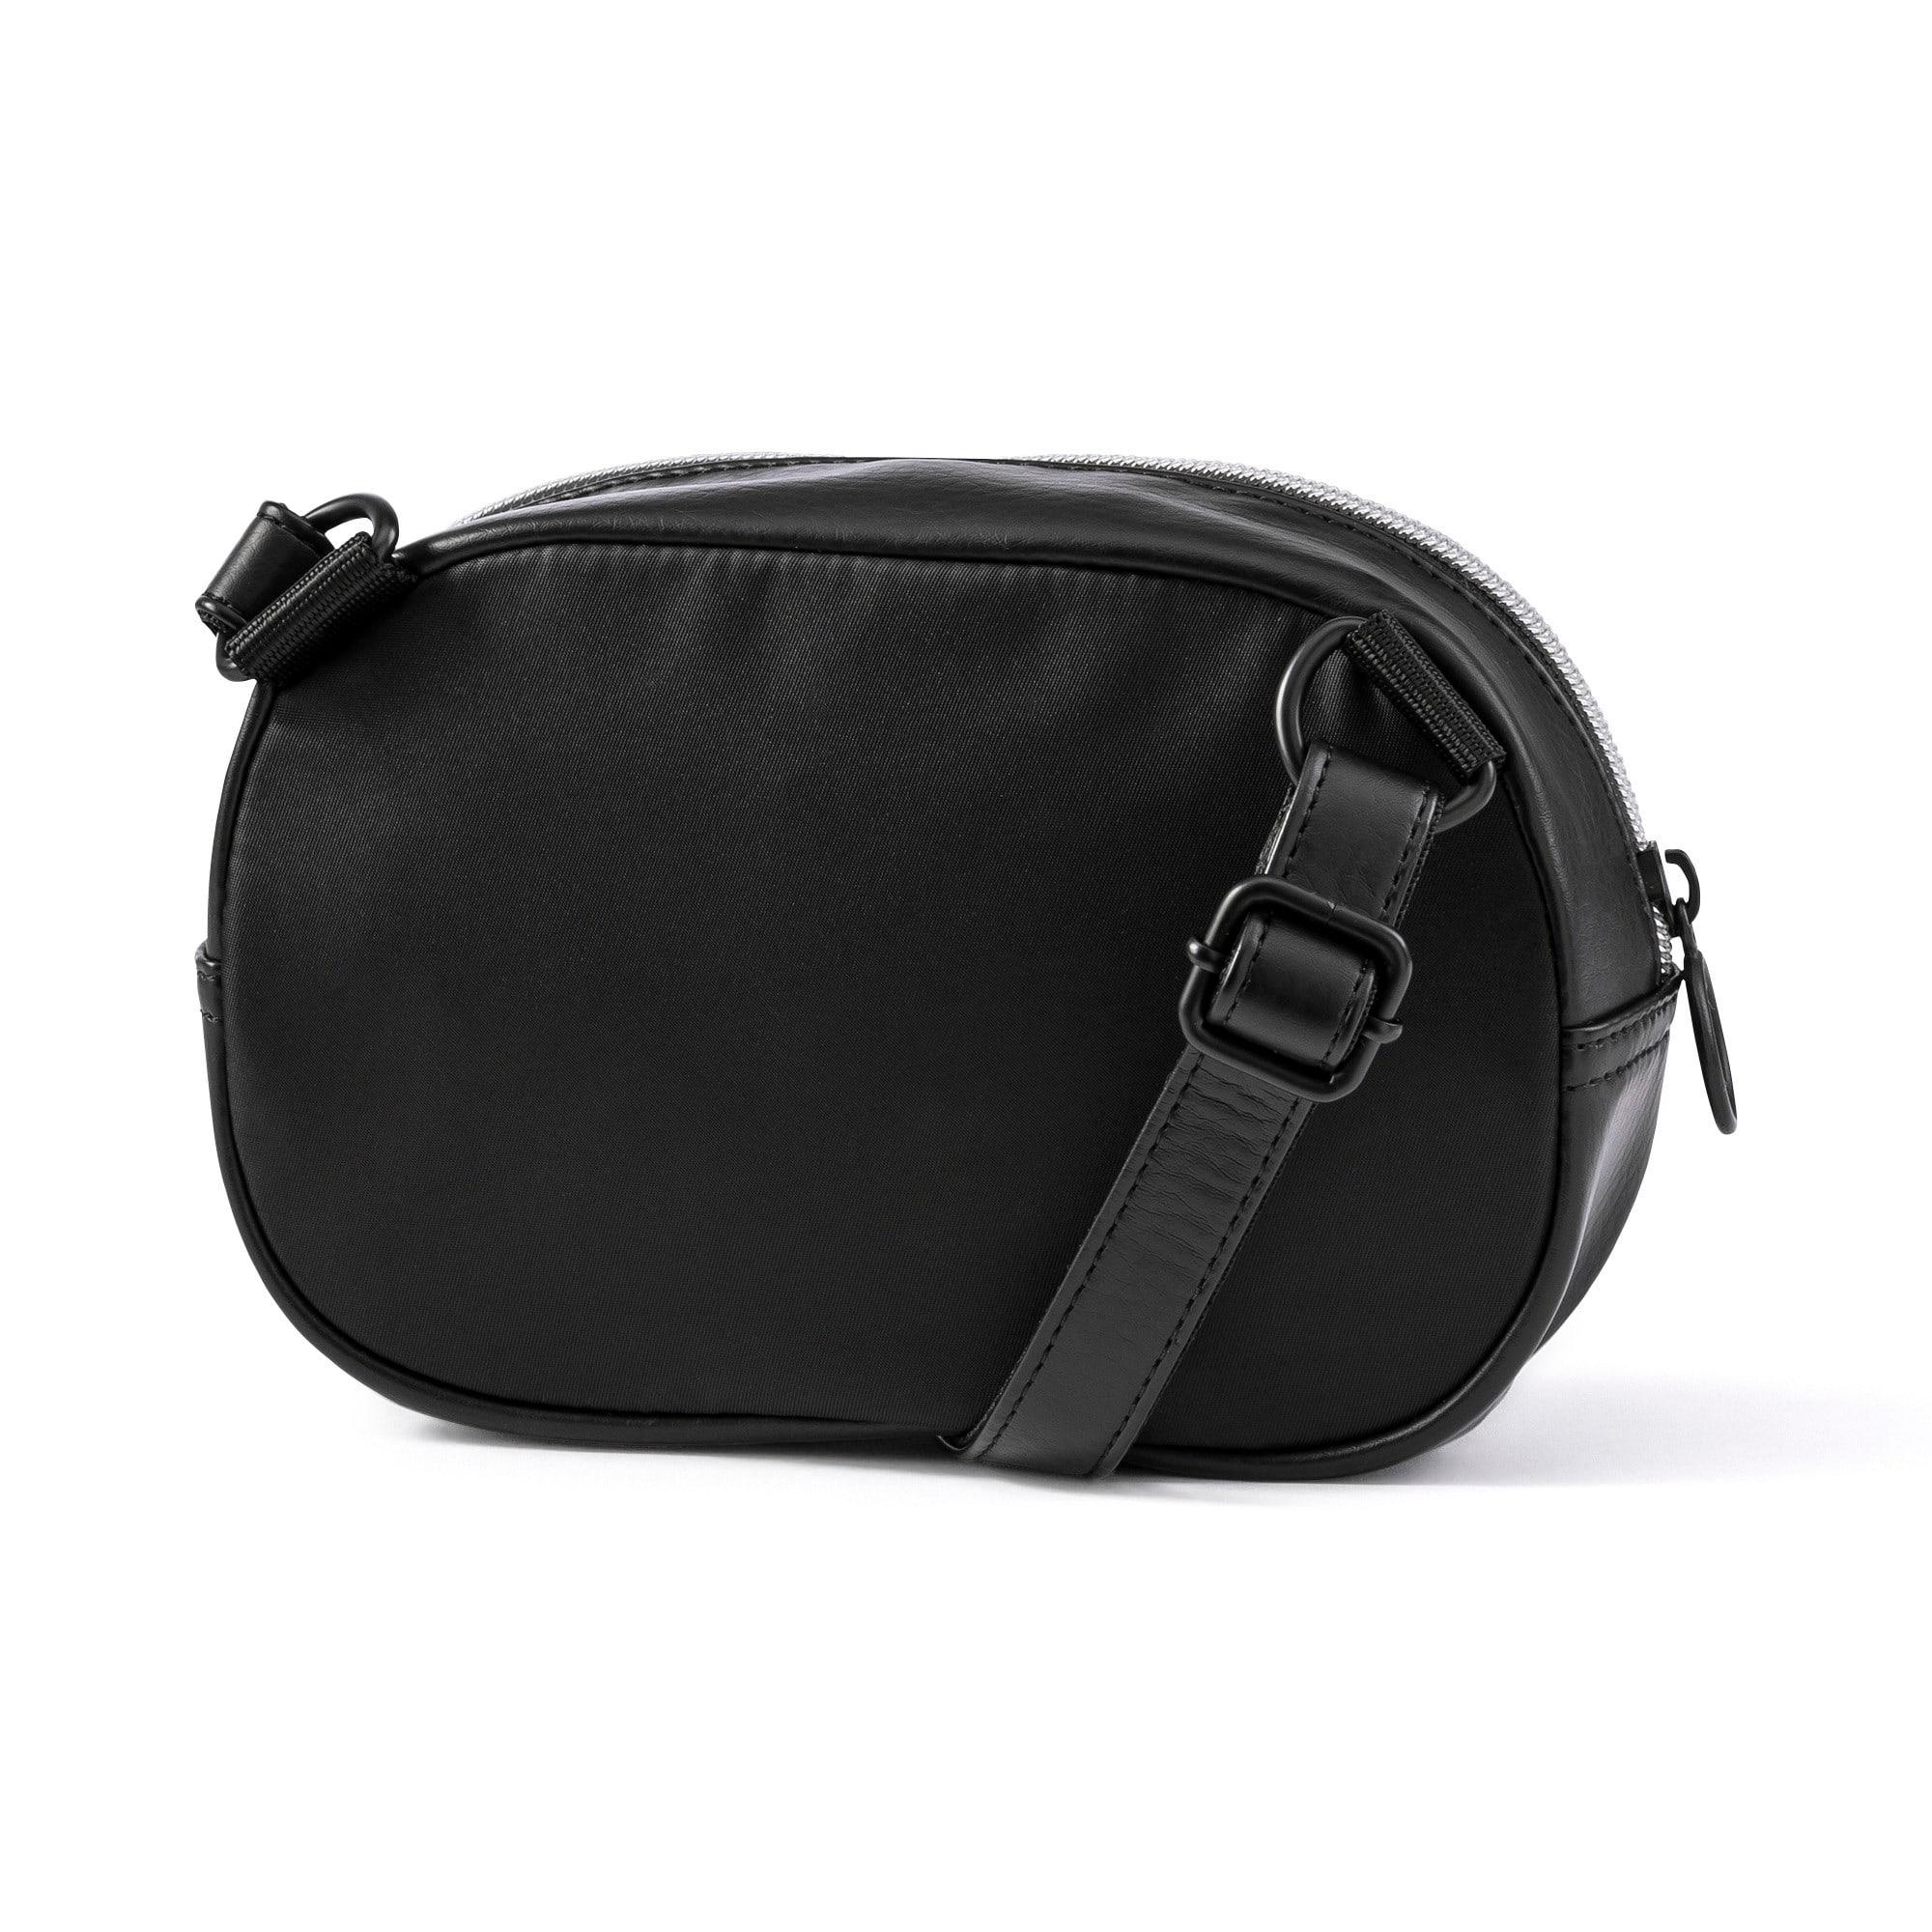 Thumbnail 3 of Classics Women's X-Body Bag, Puma Black, medium-IND